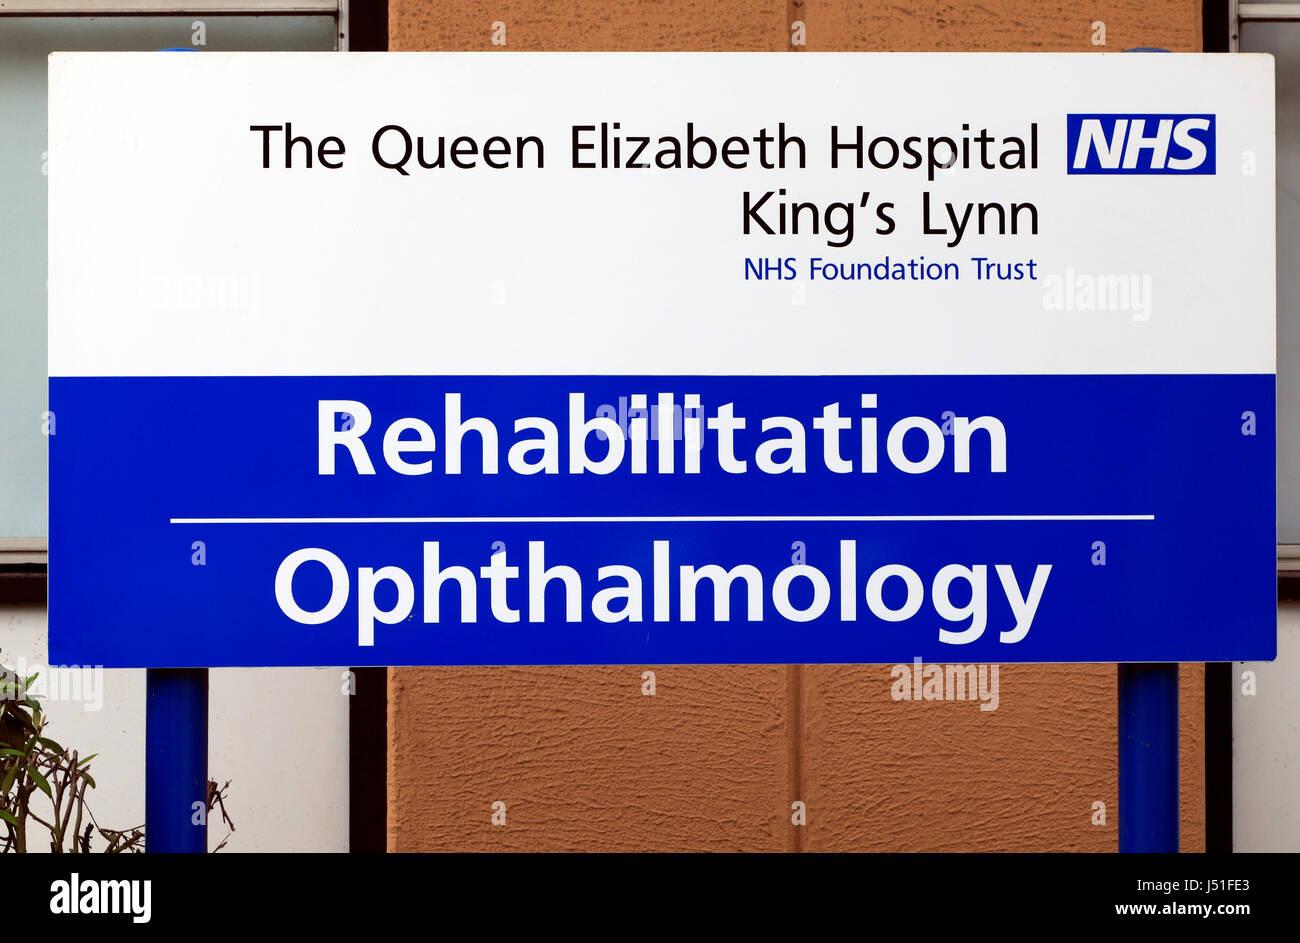 NHS Hospital, Rehabilitation, Ophthalmology department, Queen Elizabeth Hospital, Kings Lynn, Norfolk England UK - Stock Image